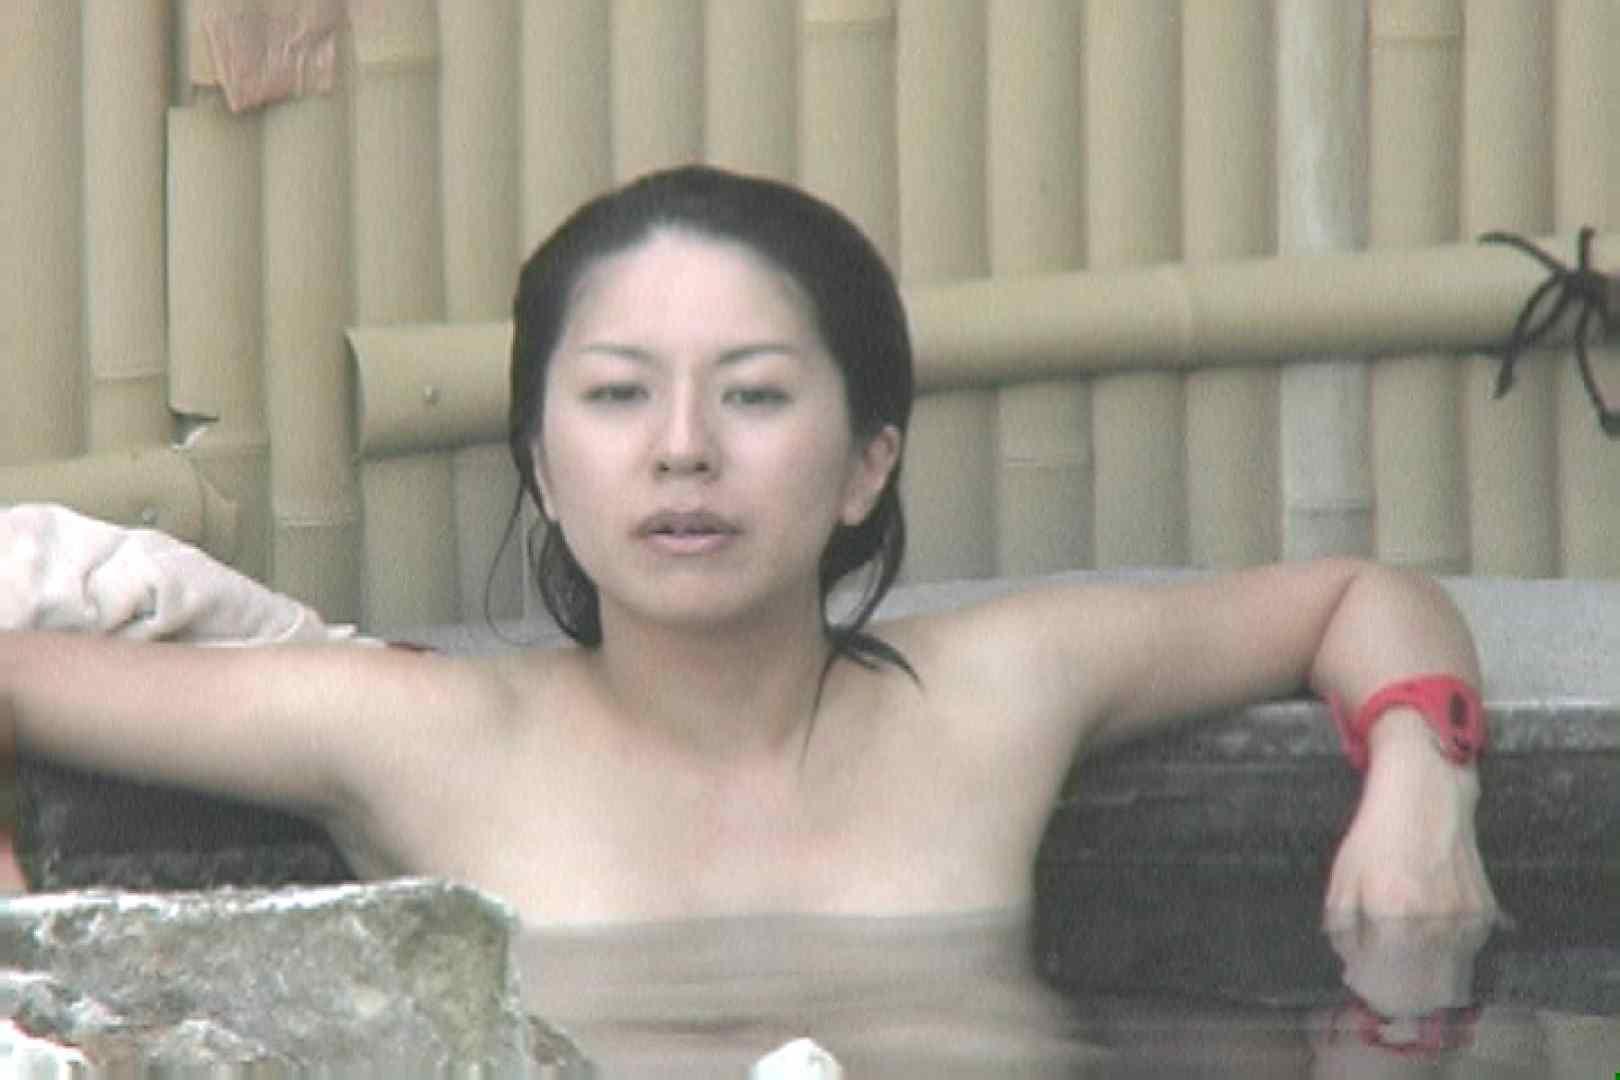 Aquaな露天風呂Vol.694 露天 | OLセックス  67画像 34